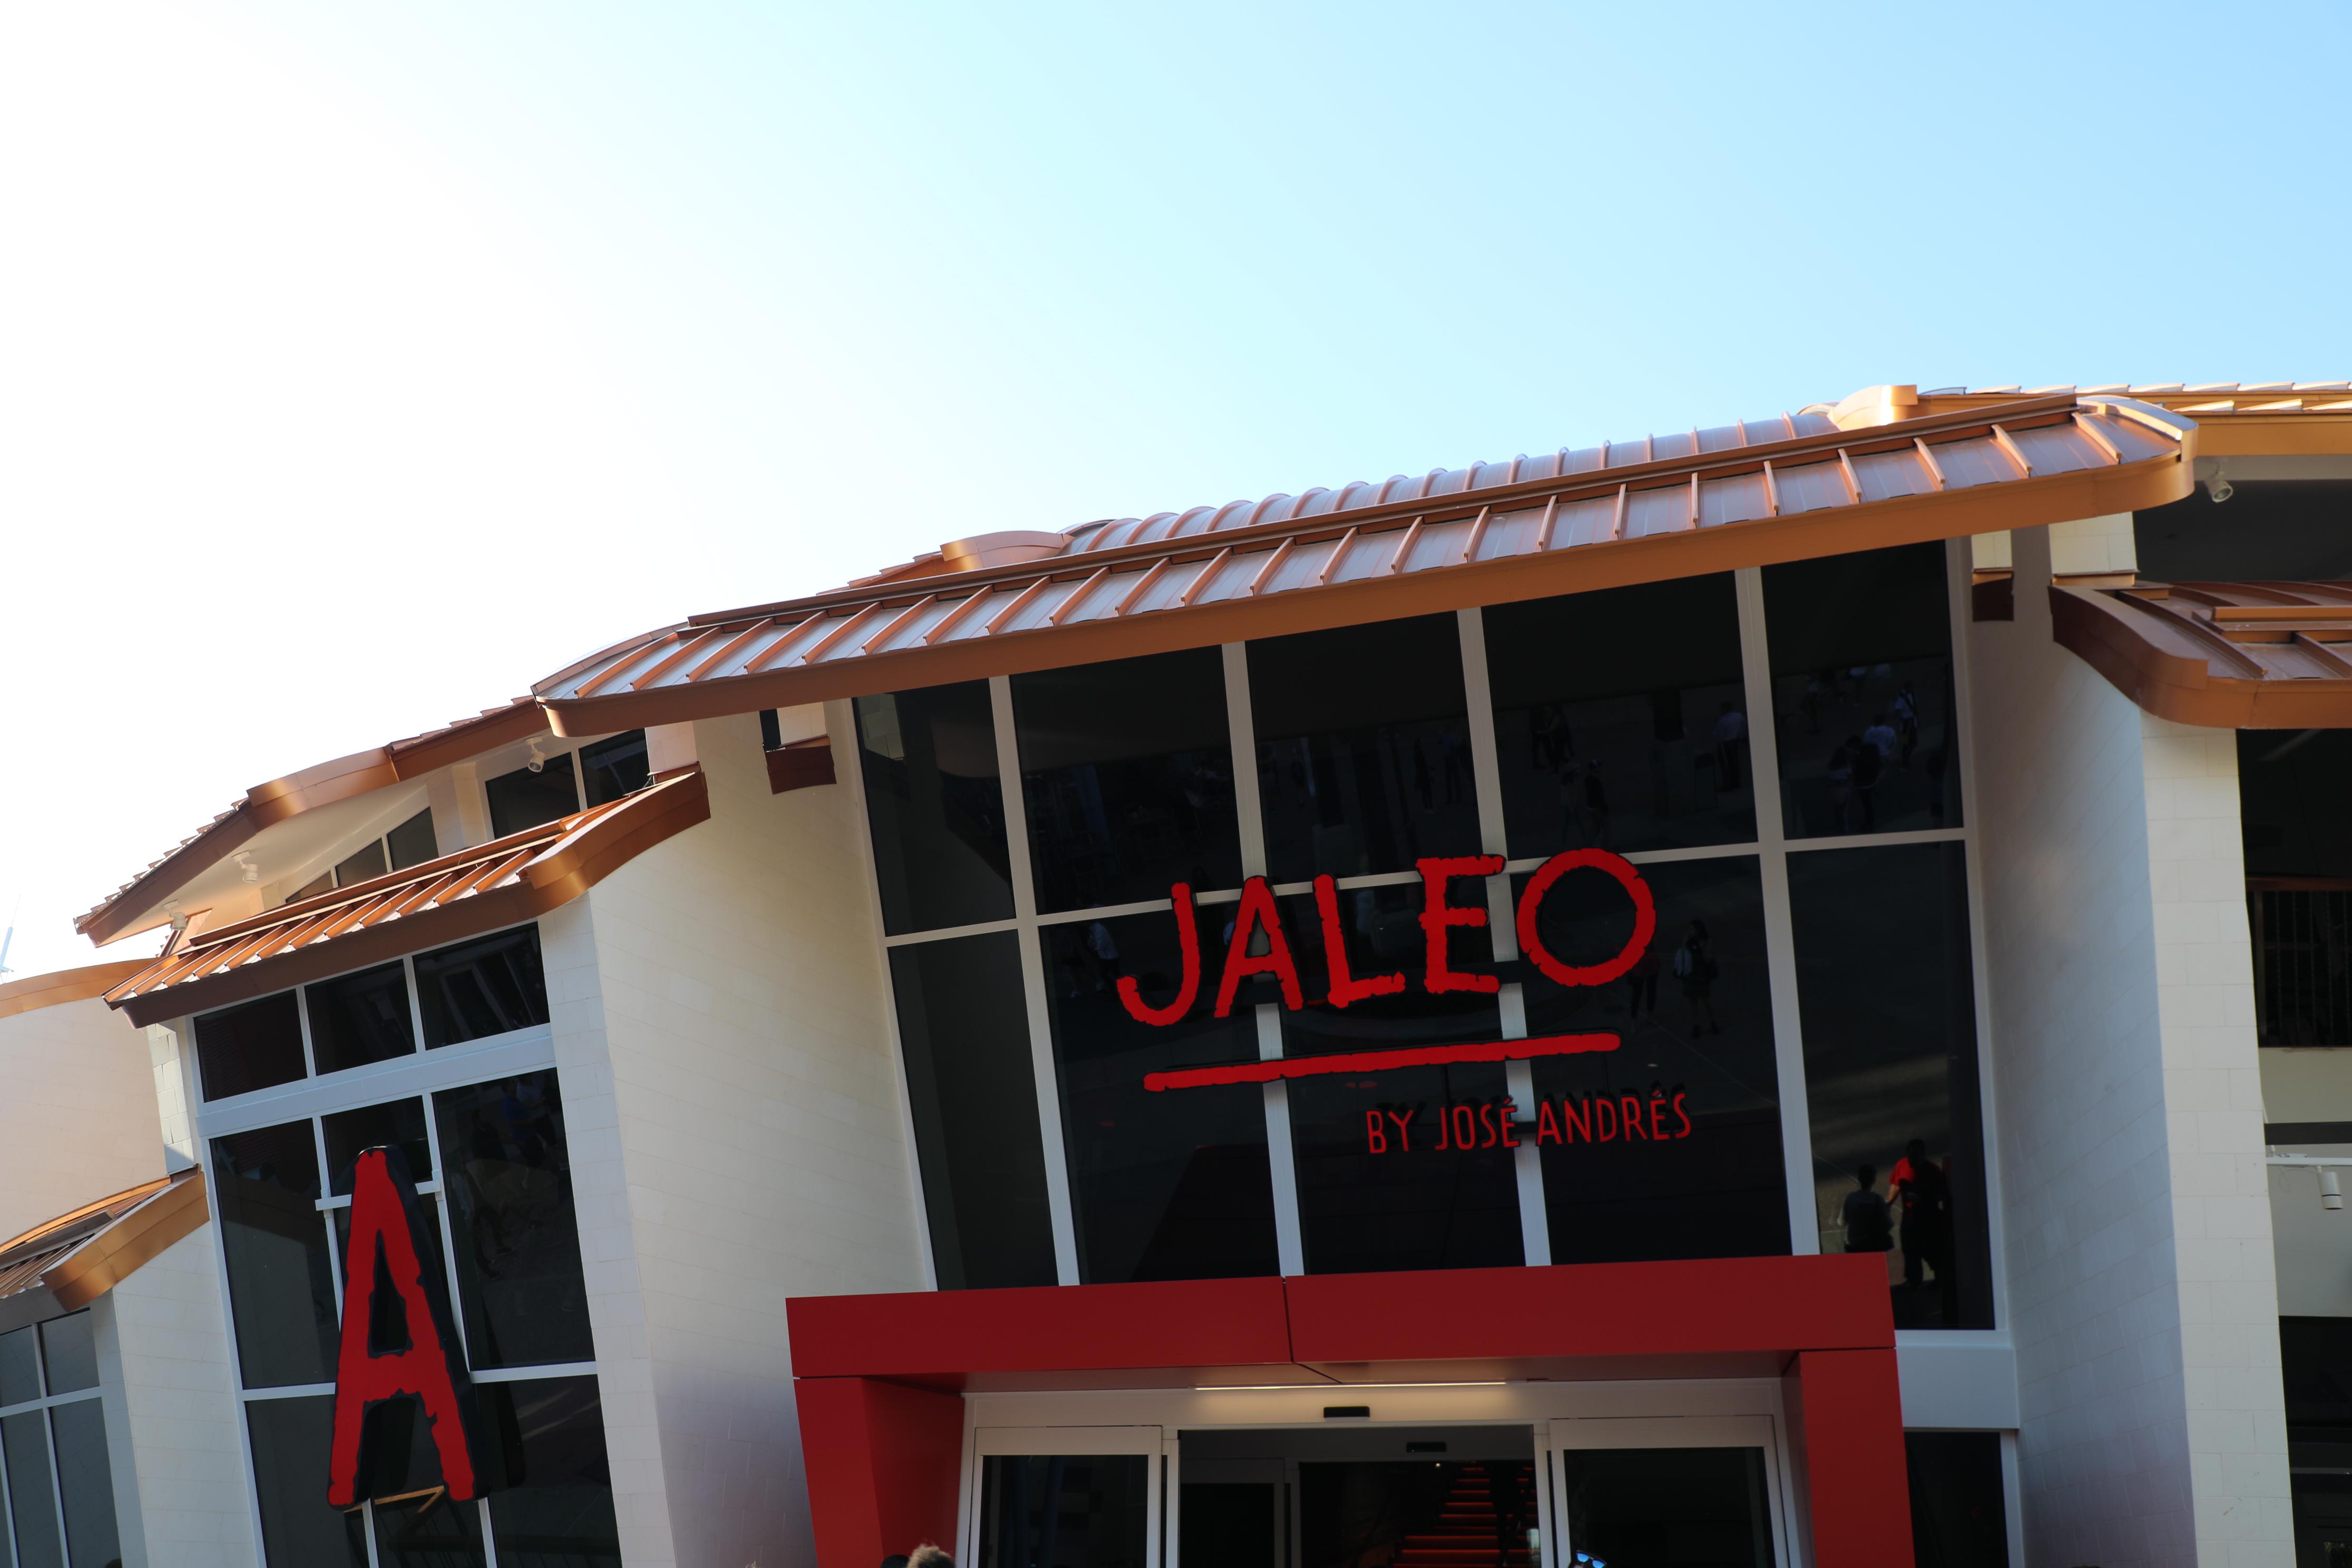 An exterior shot of the restaurant Jaleo